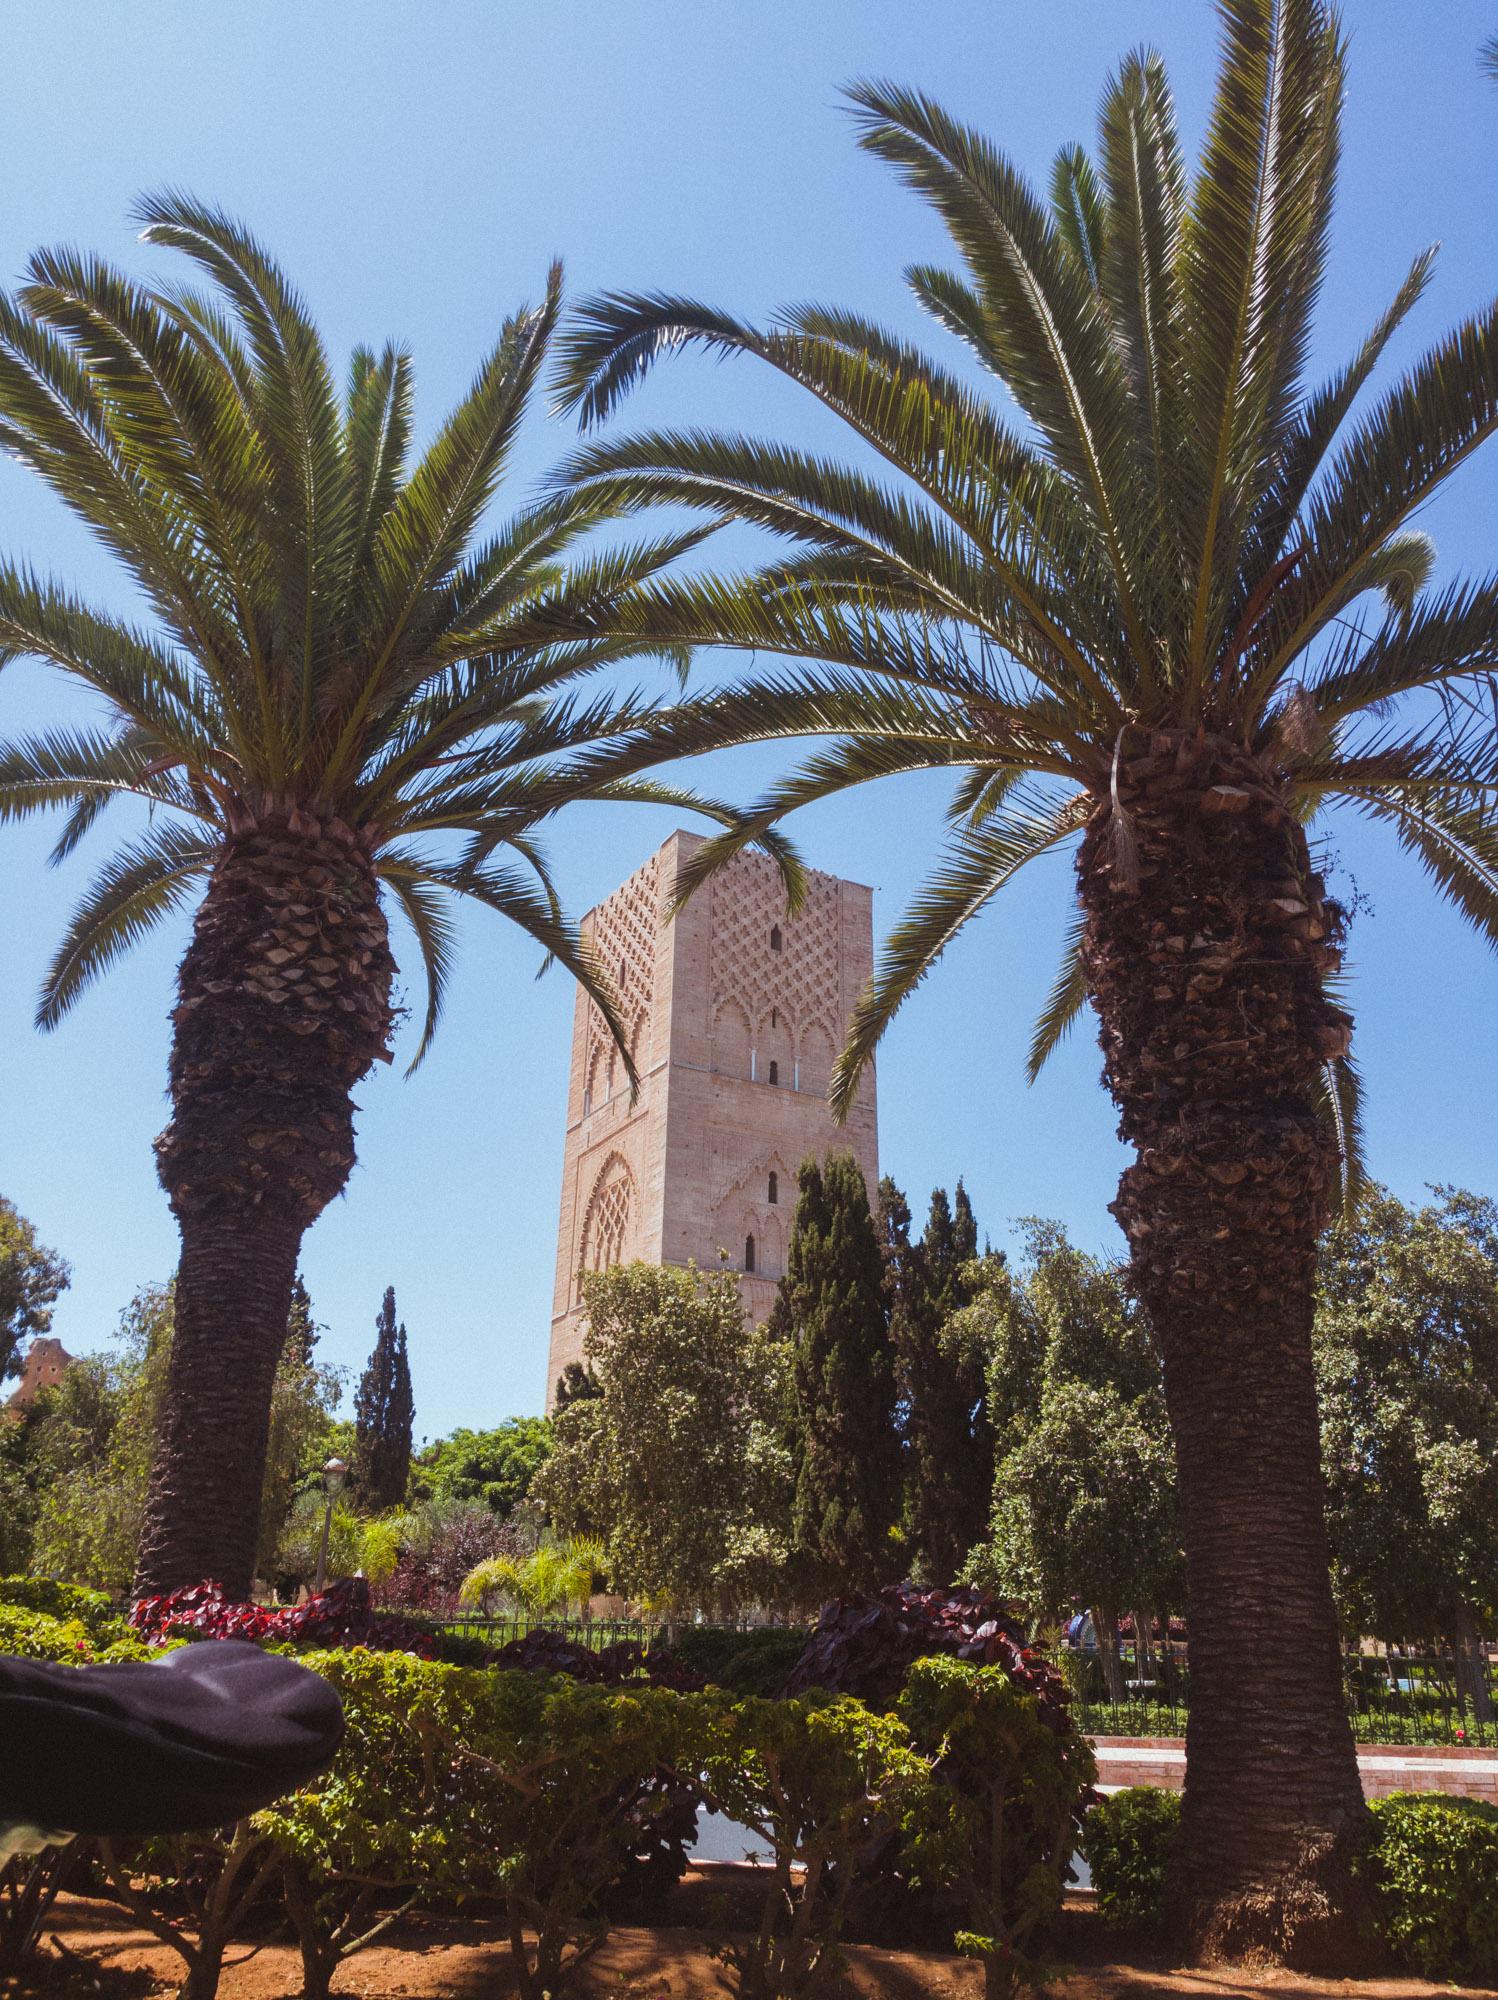 Hassan-Turm im Mausoleum von Mohammed V in Rabat, Marokko